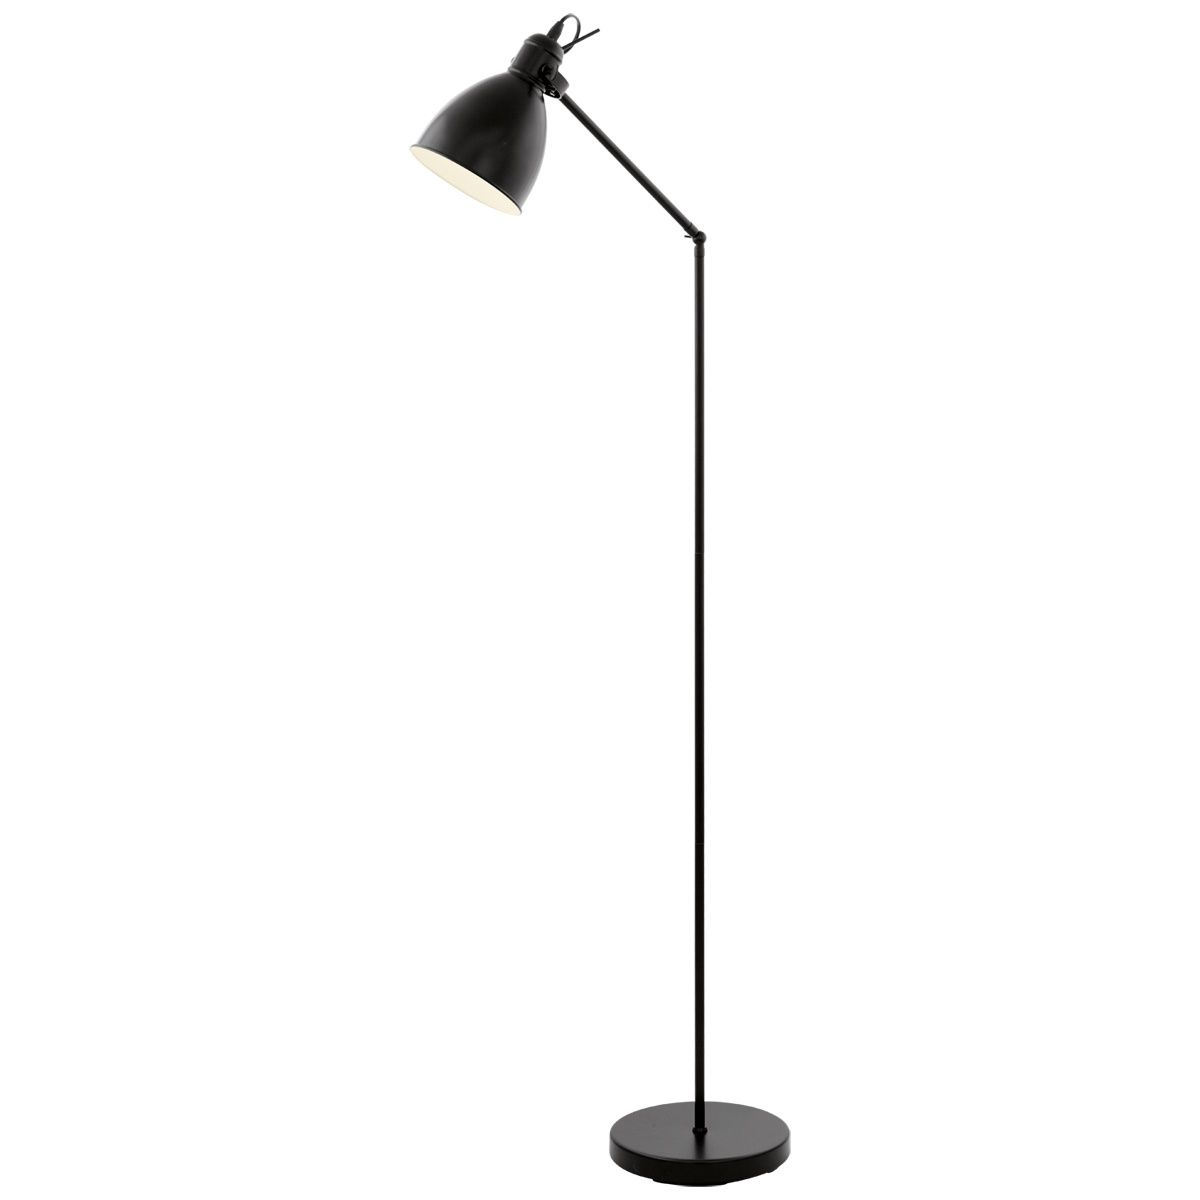 Lampa Podlogowa Eglo Priddy 49471 1x40w E27 Metalowa Czarna With Images Lampa Podlogowa Lampy Lampa Na Biurko